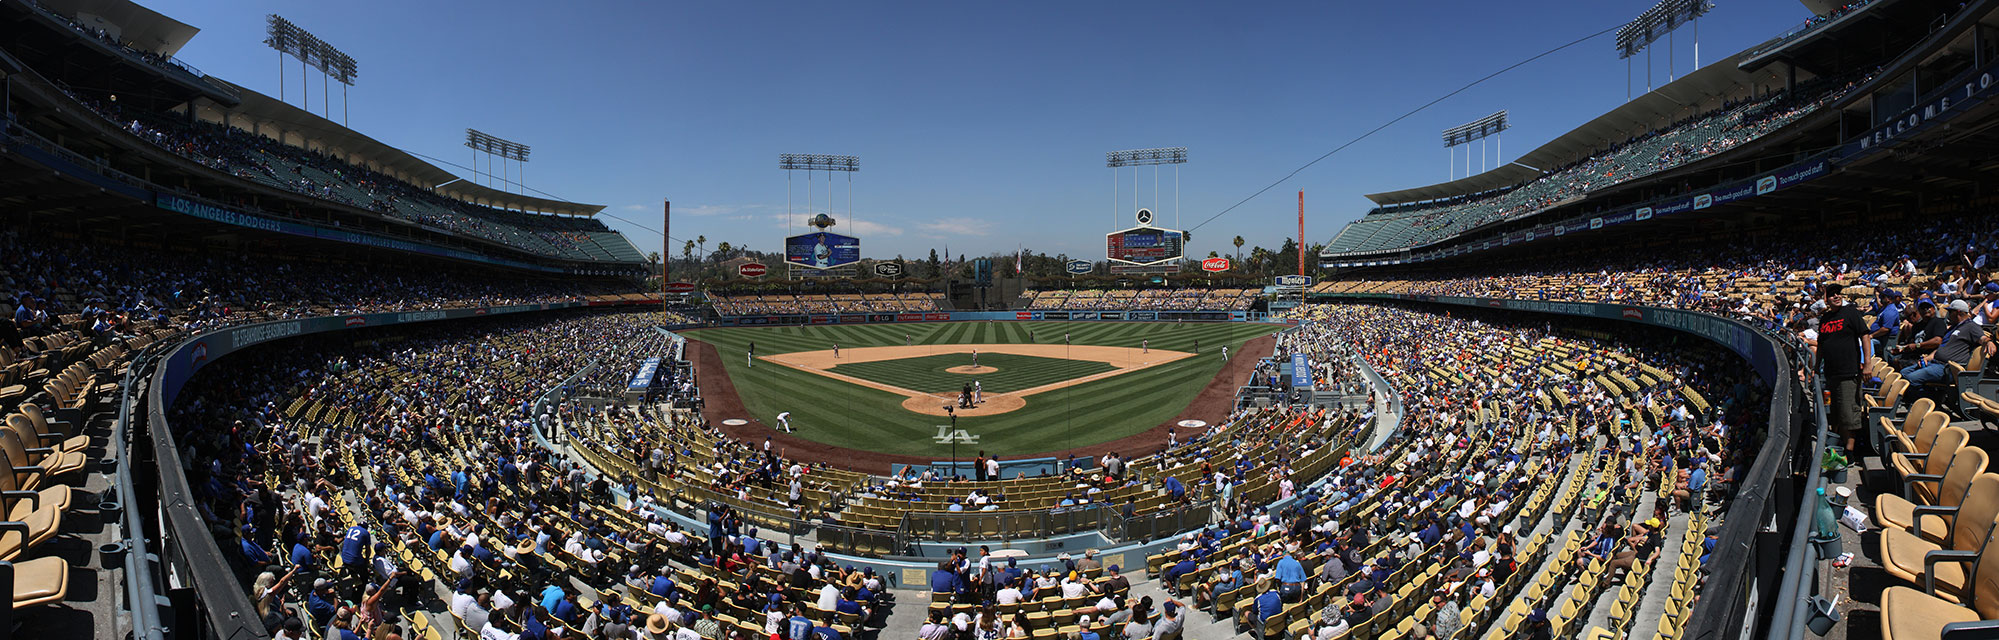 Dodgers Stadium. Photo: Tom Denne